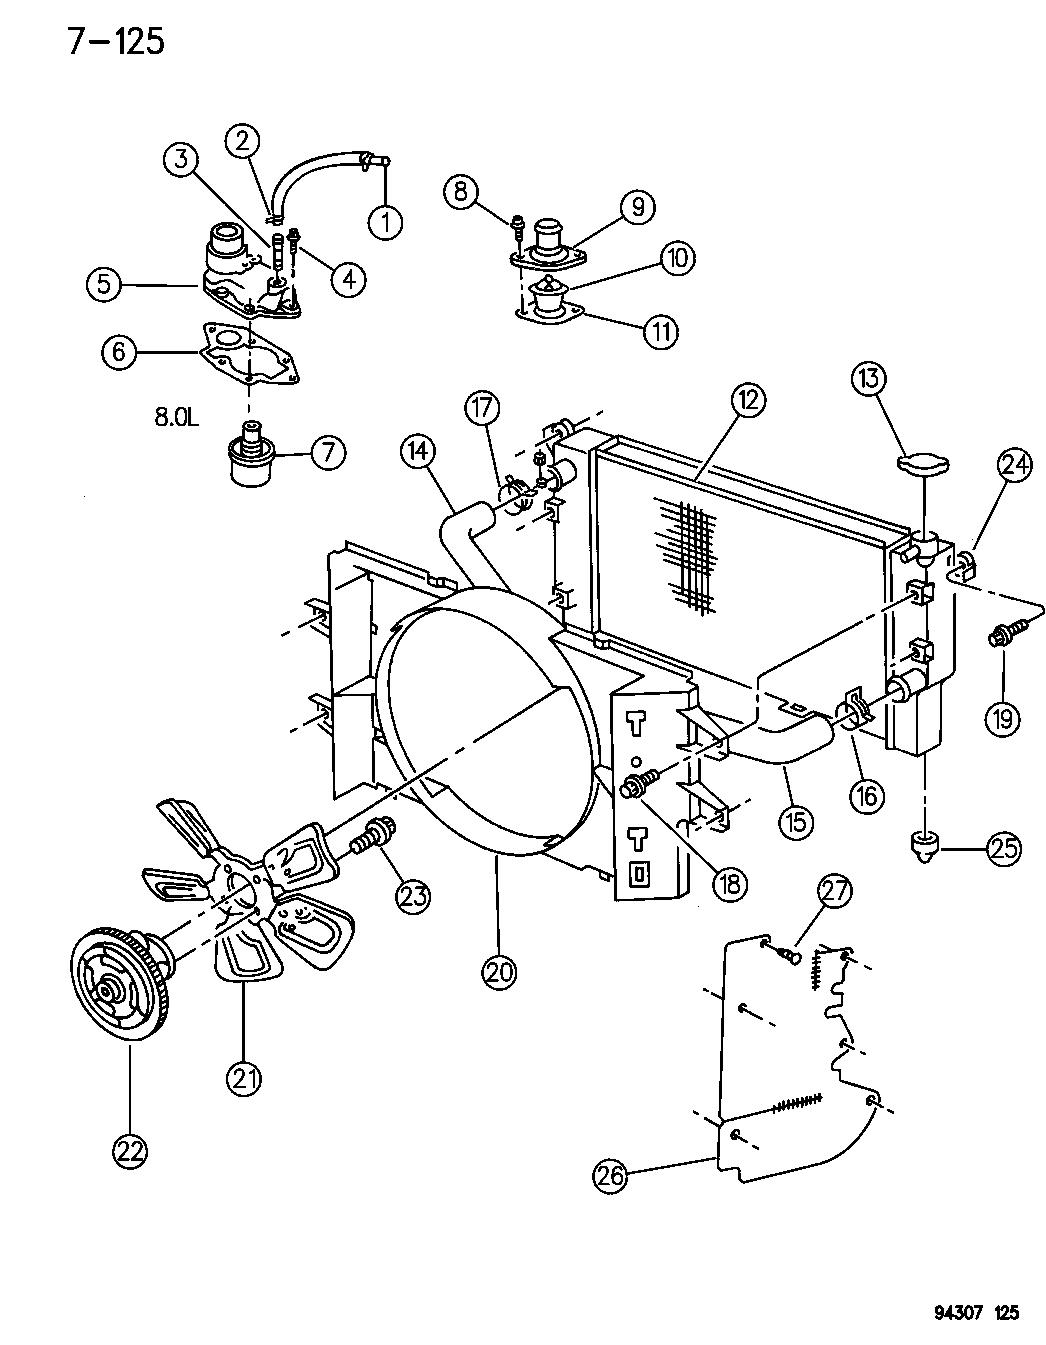 1995 Dodge Ram 1500 Radiator & Related Parts